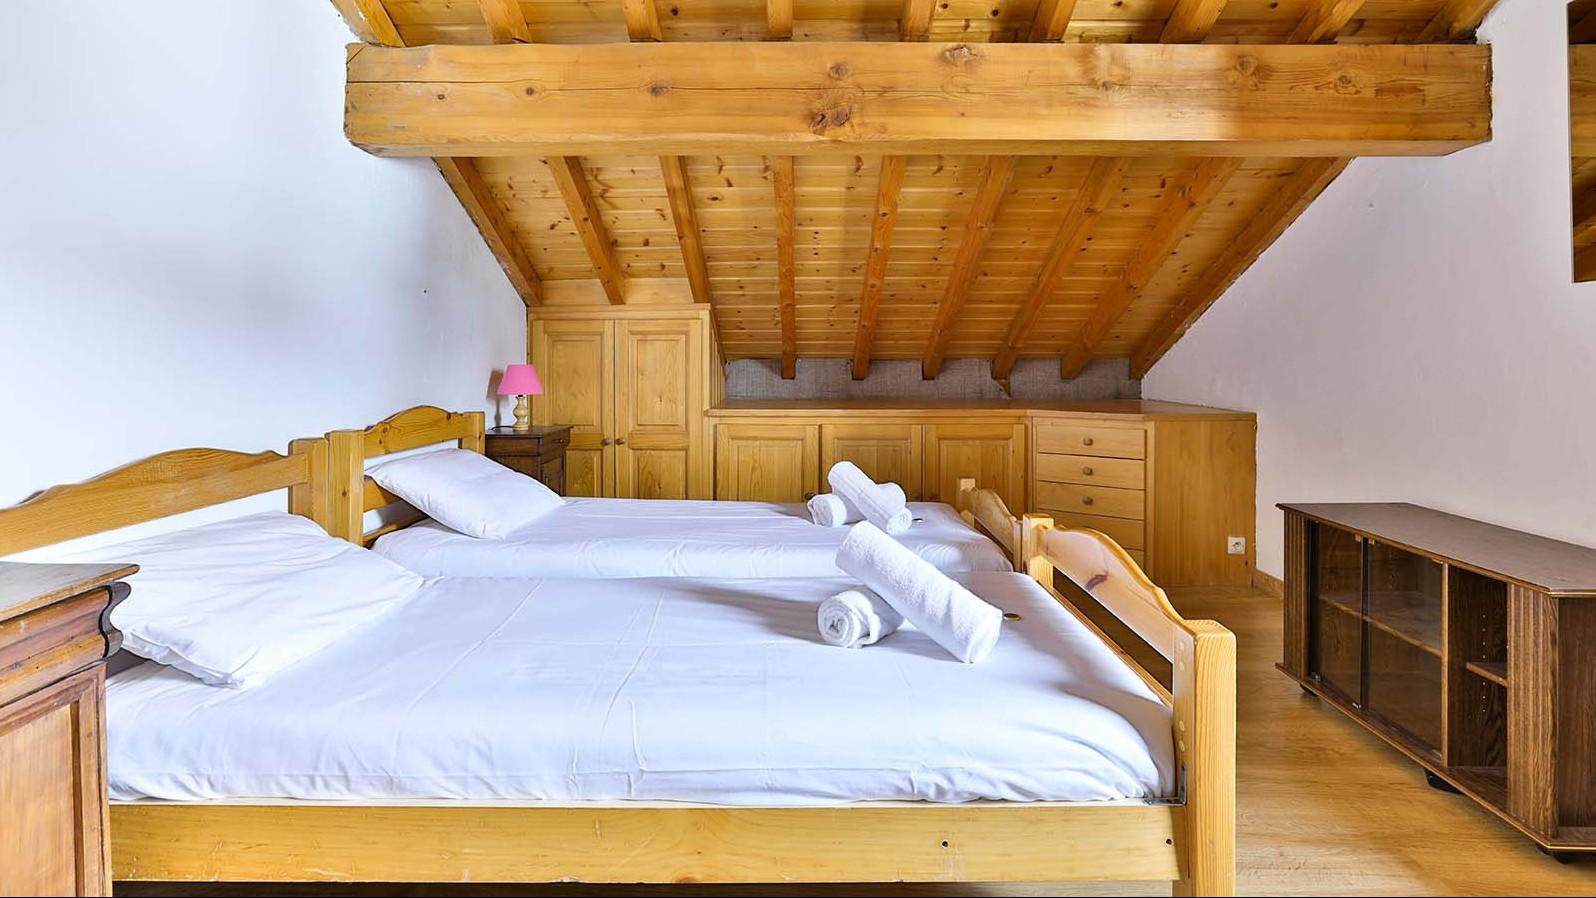 Twin Room,  Chalet Leopold, Meribel, France